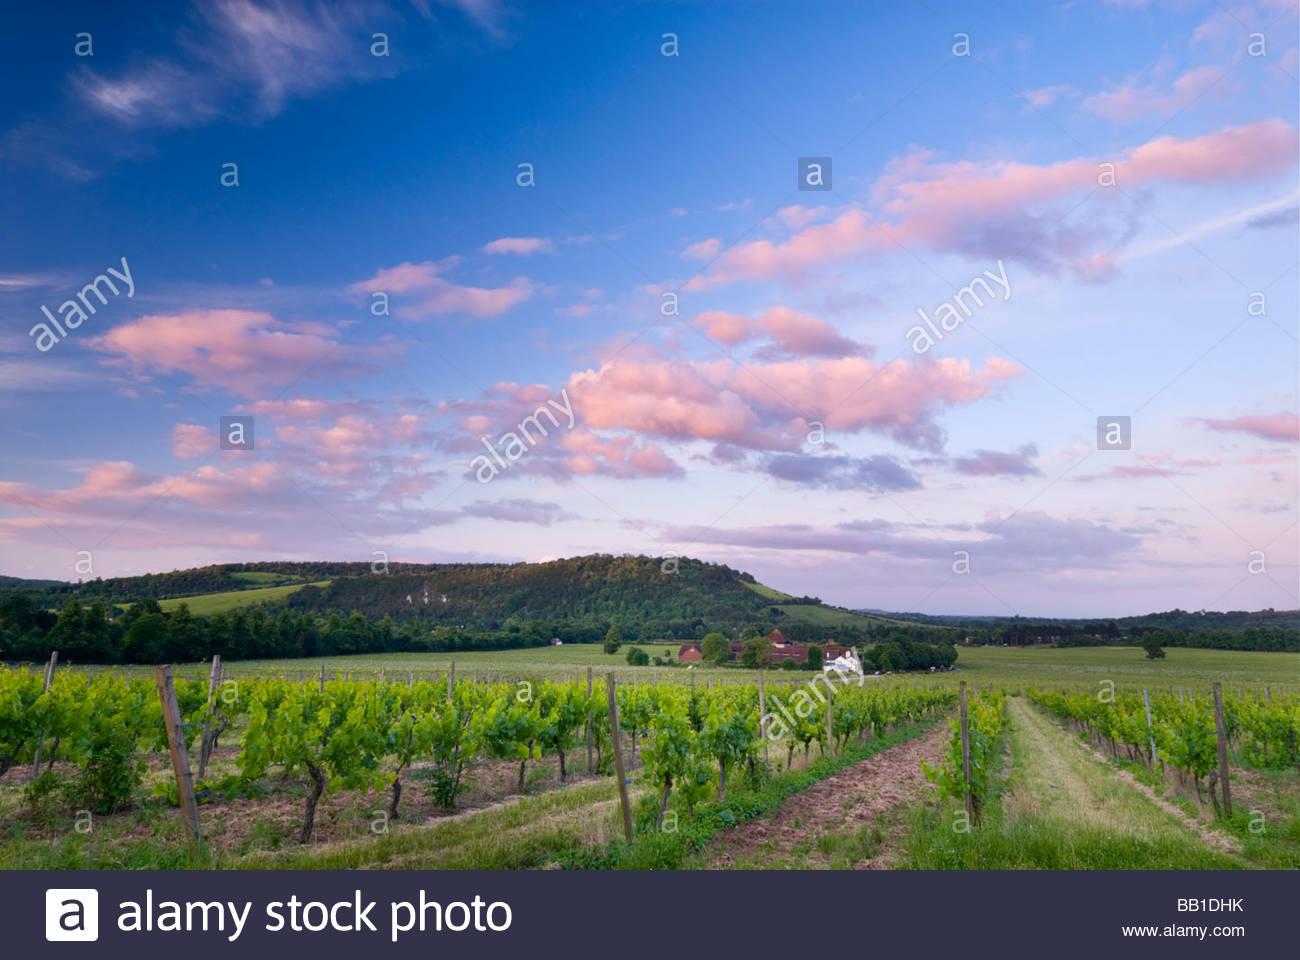 Vignoble Denbies Wine Estate et, Dorking, Surrey, Angleterre. Photo Stock